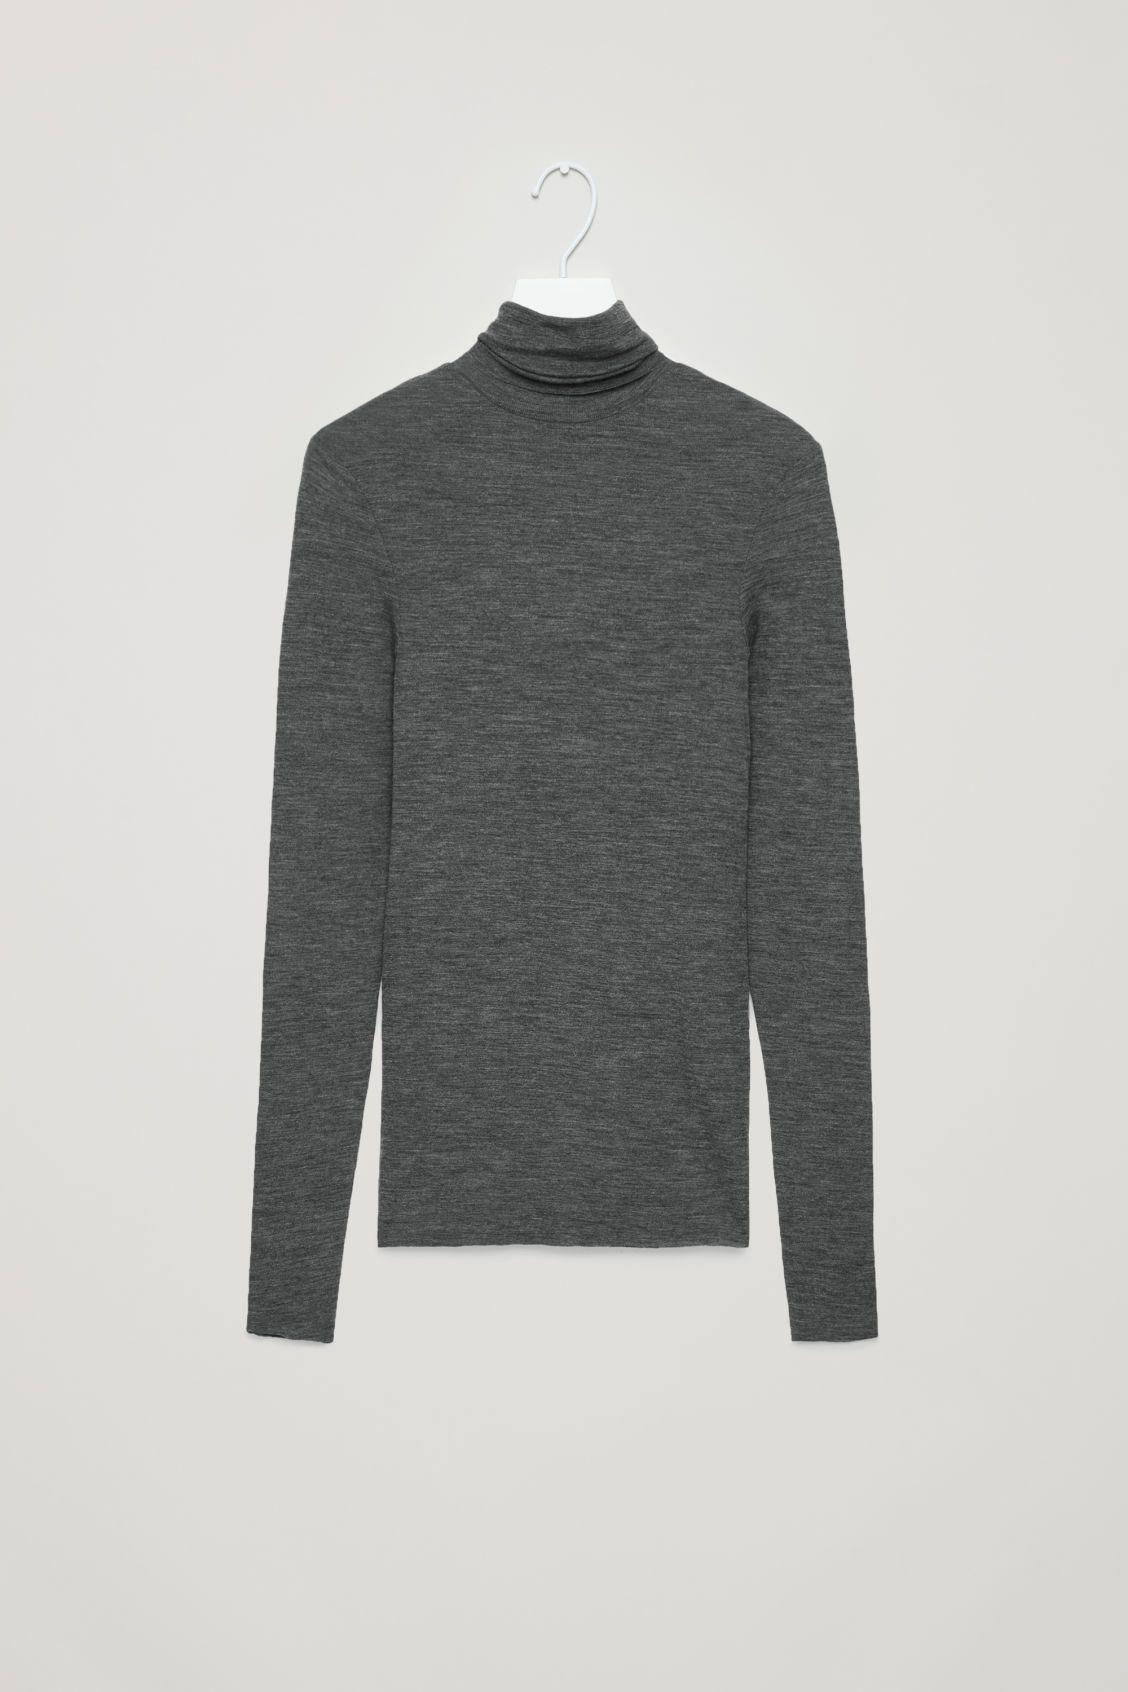 Cos green dress 2018  COS  Fine rollneck wool top  WBekleidung  Pinterest